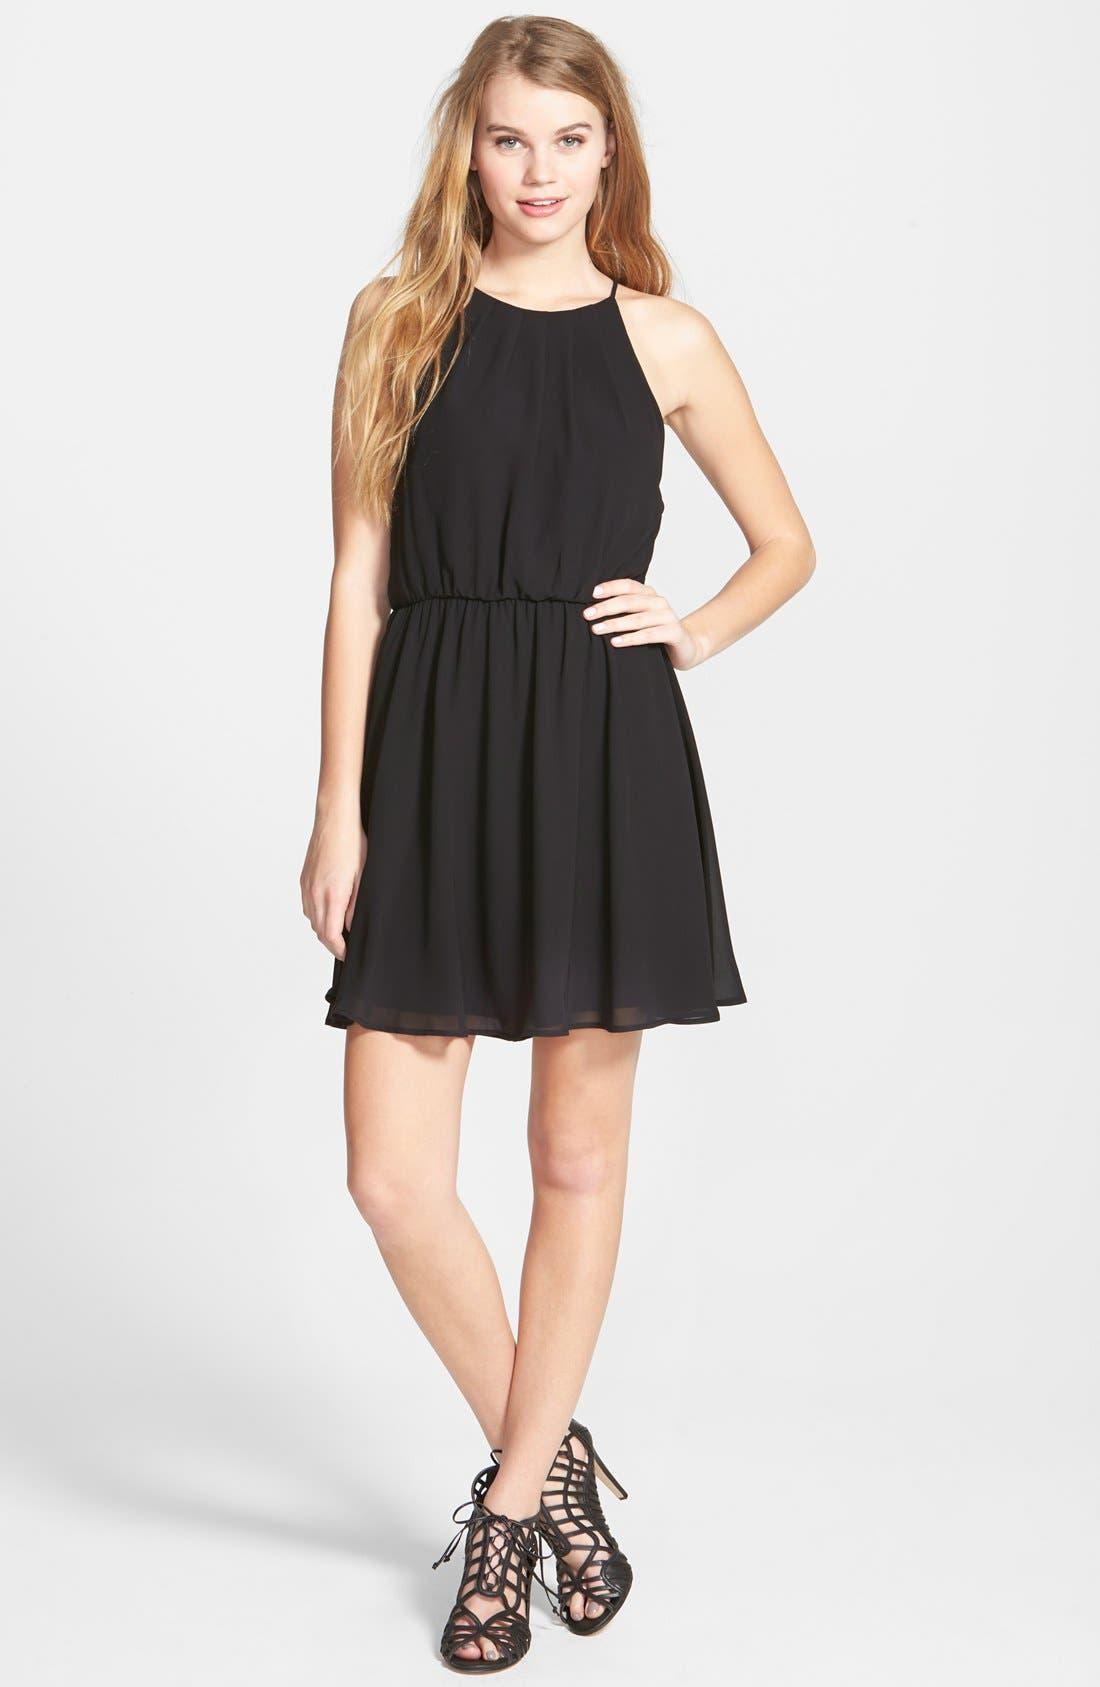 Blouson Chiffon Skater Dress,                         Main,                         color, 001